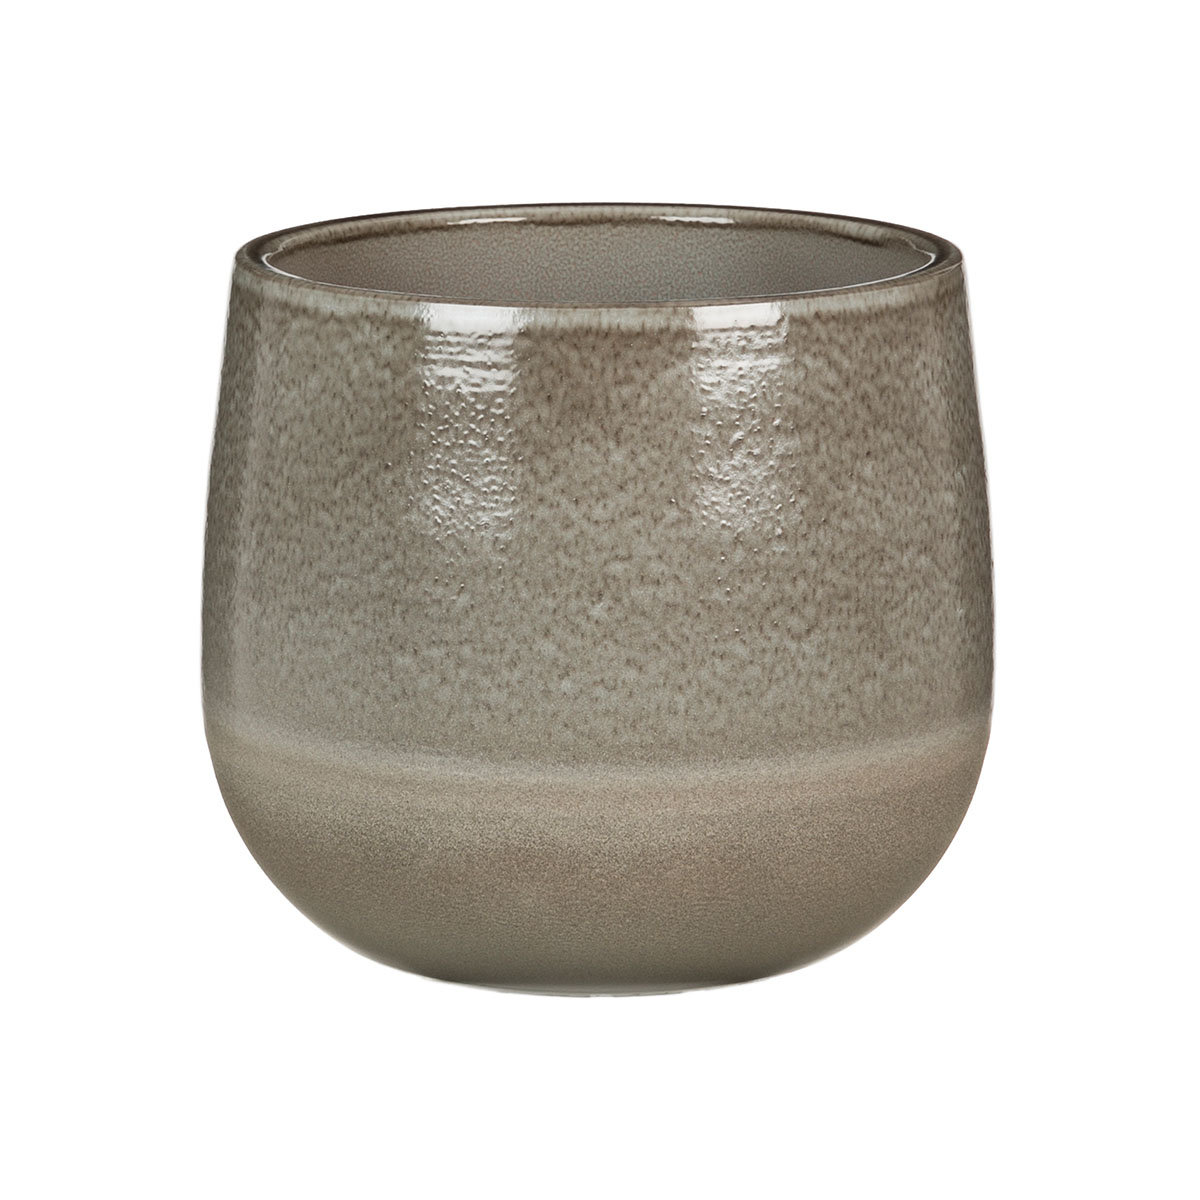 Übertopf Grey Allure, 15 cm, Grau